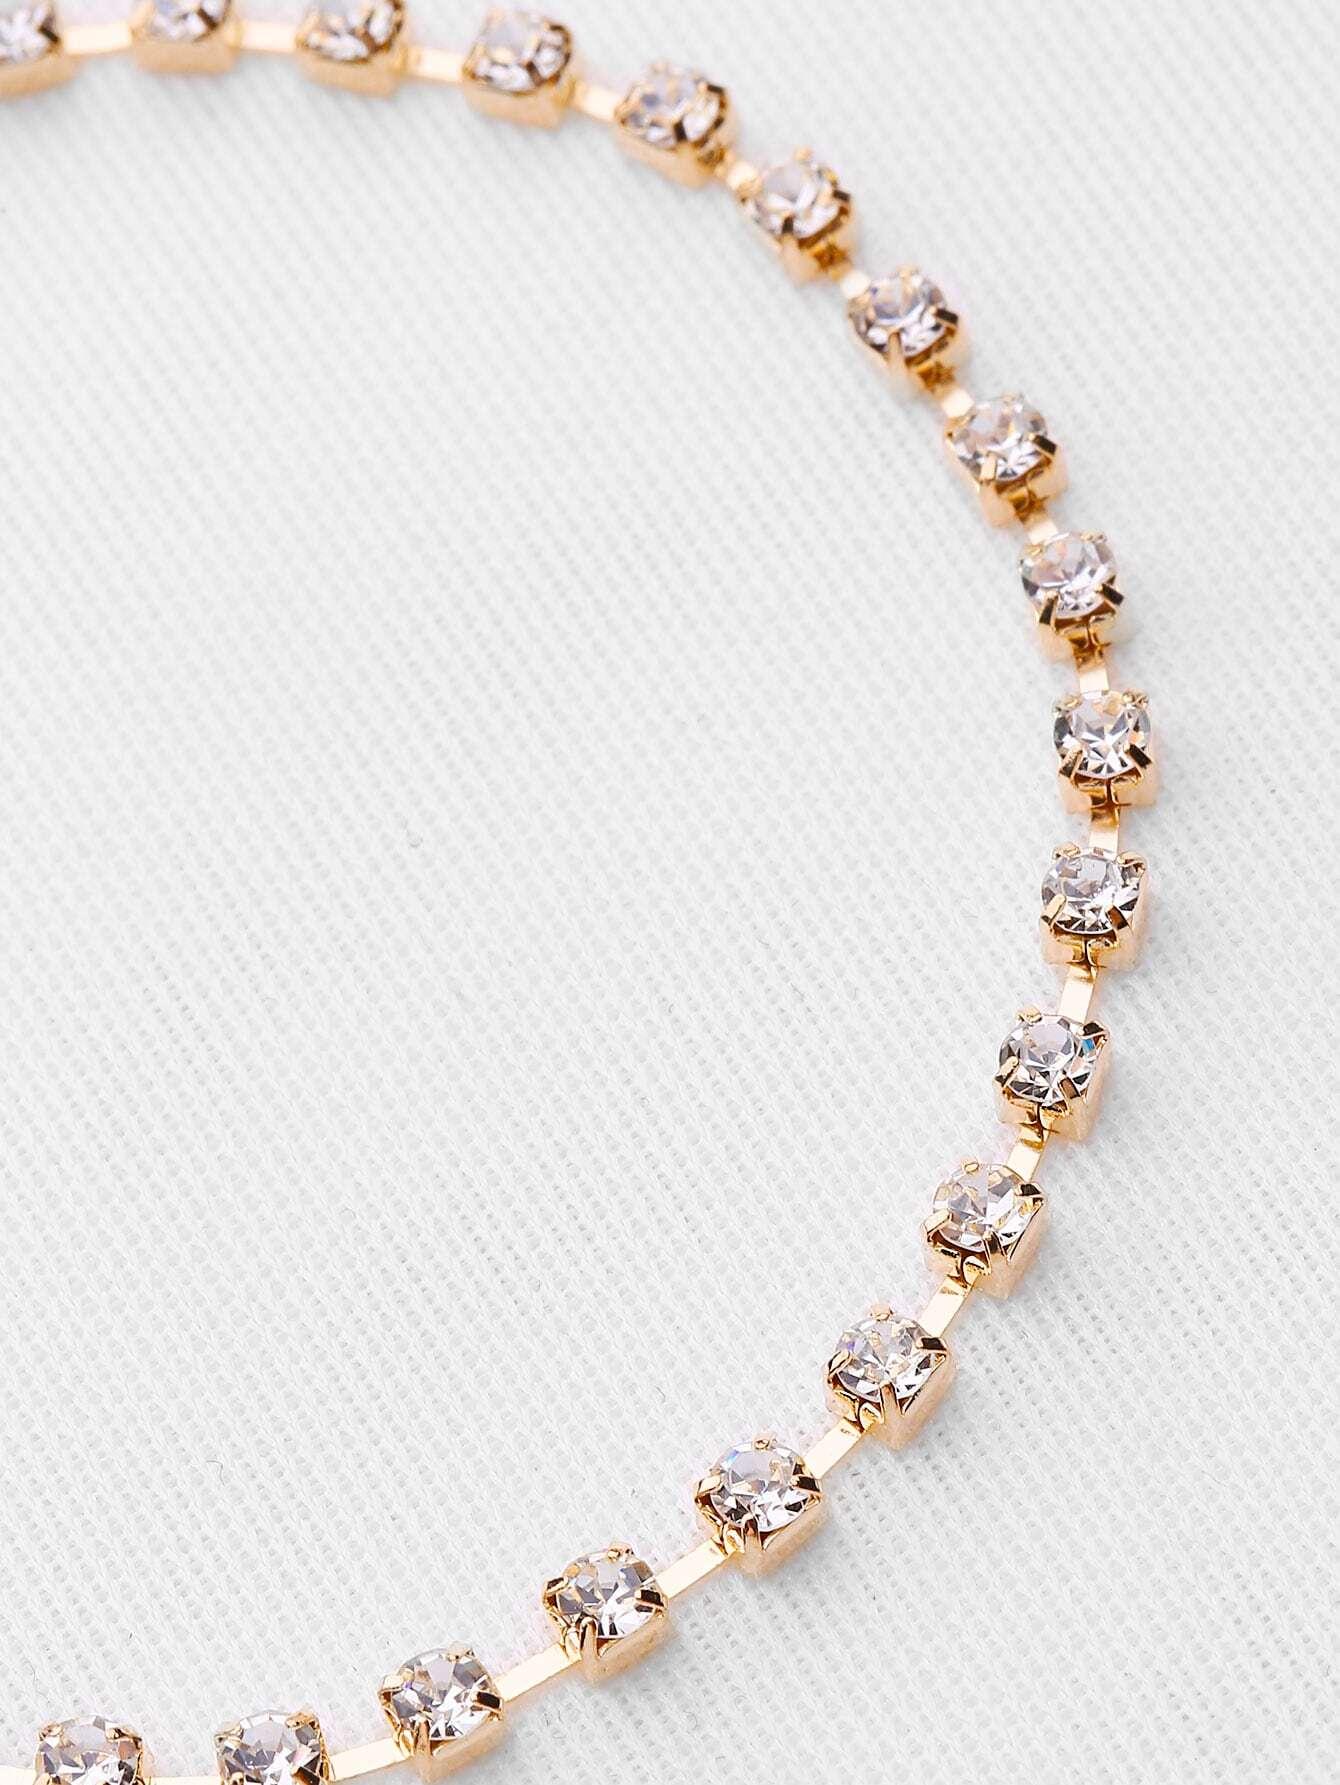 Rhinestone Decorated Delicate Bracelet -SheIn(Sheinside)